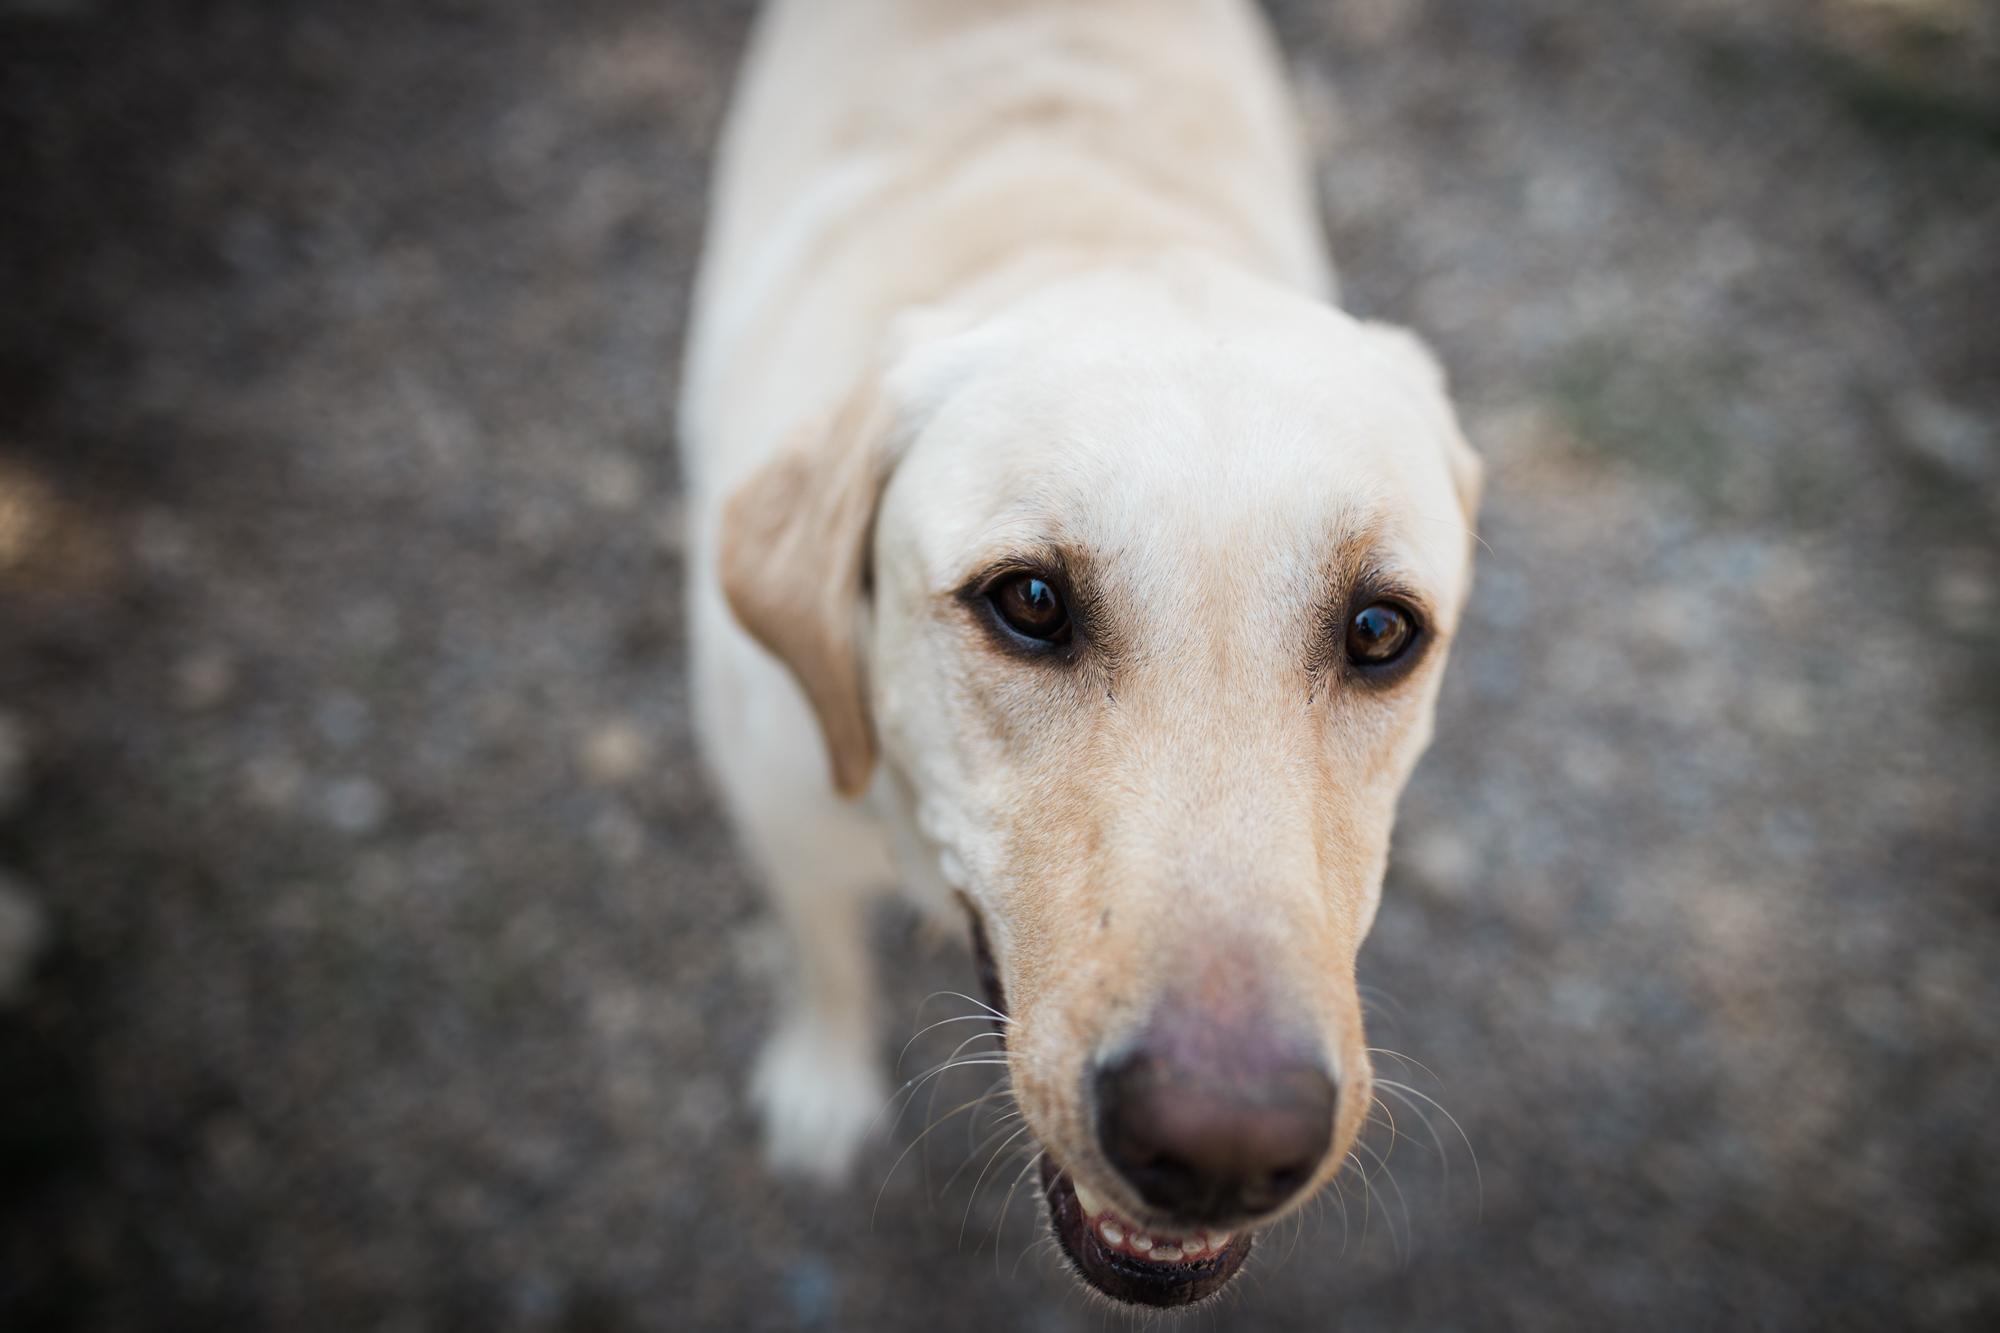 Barking-Good-Dogs-13.jpg